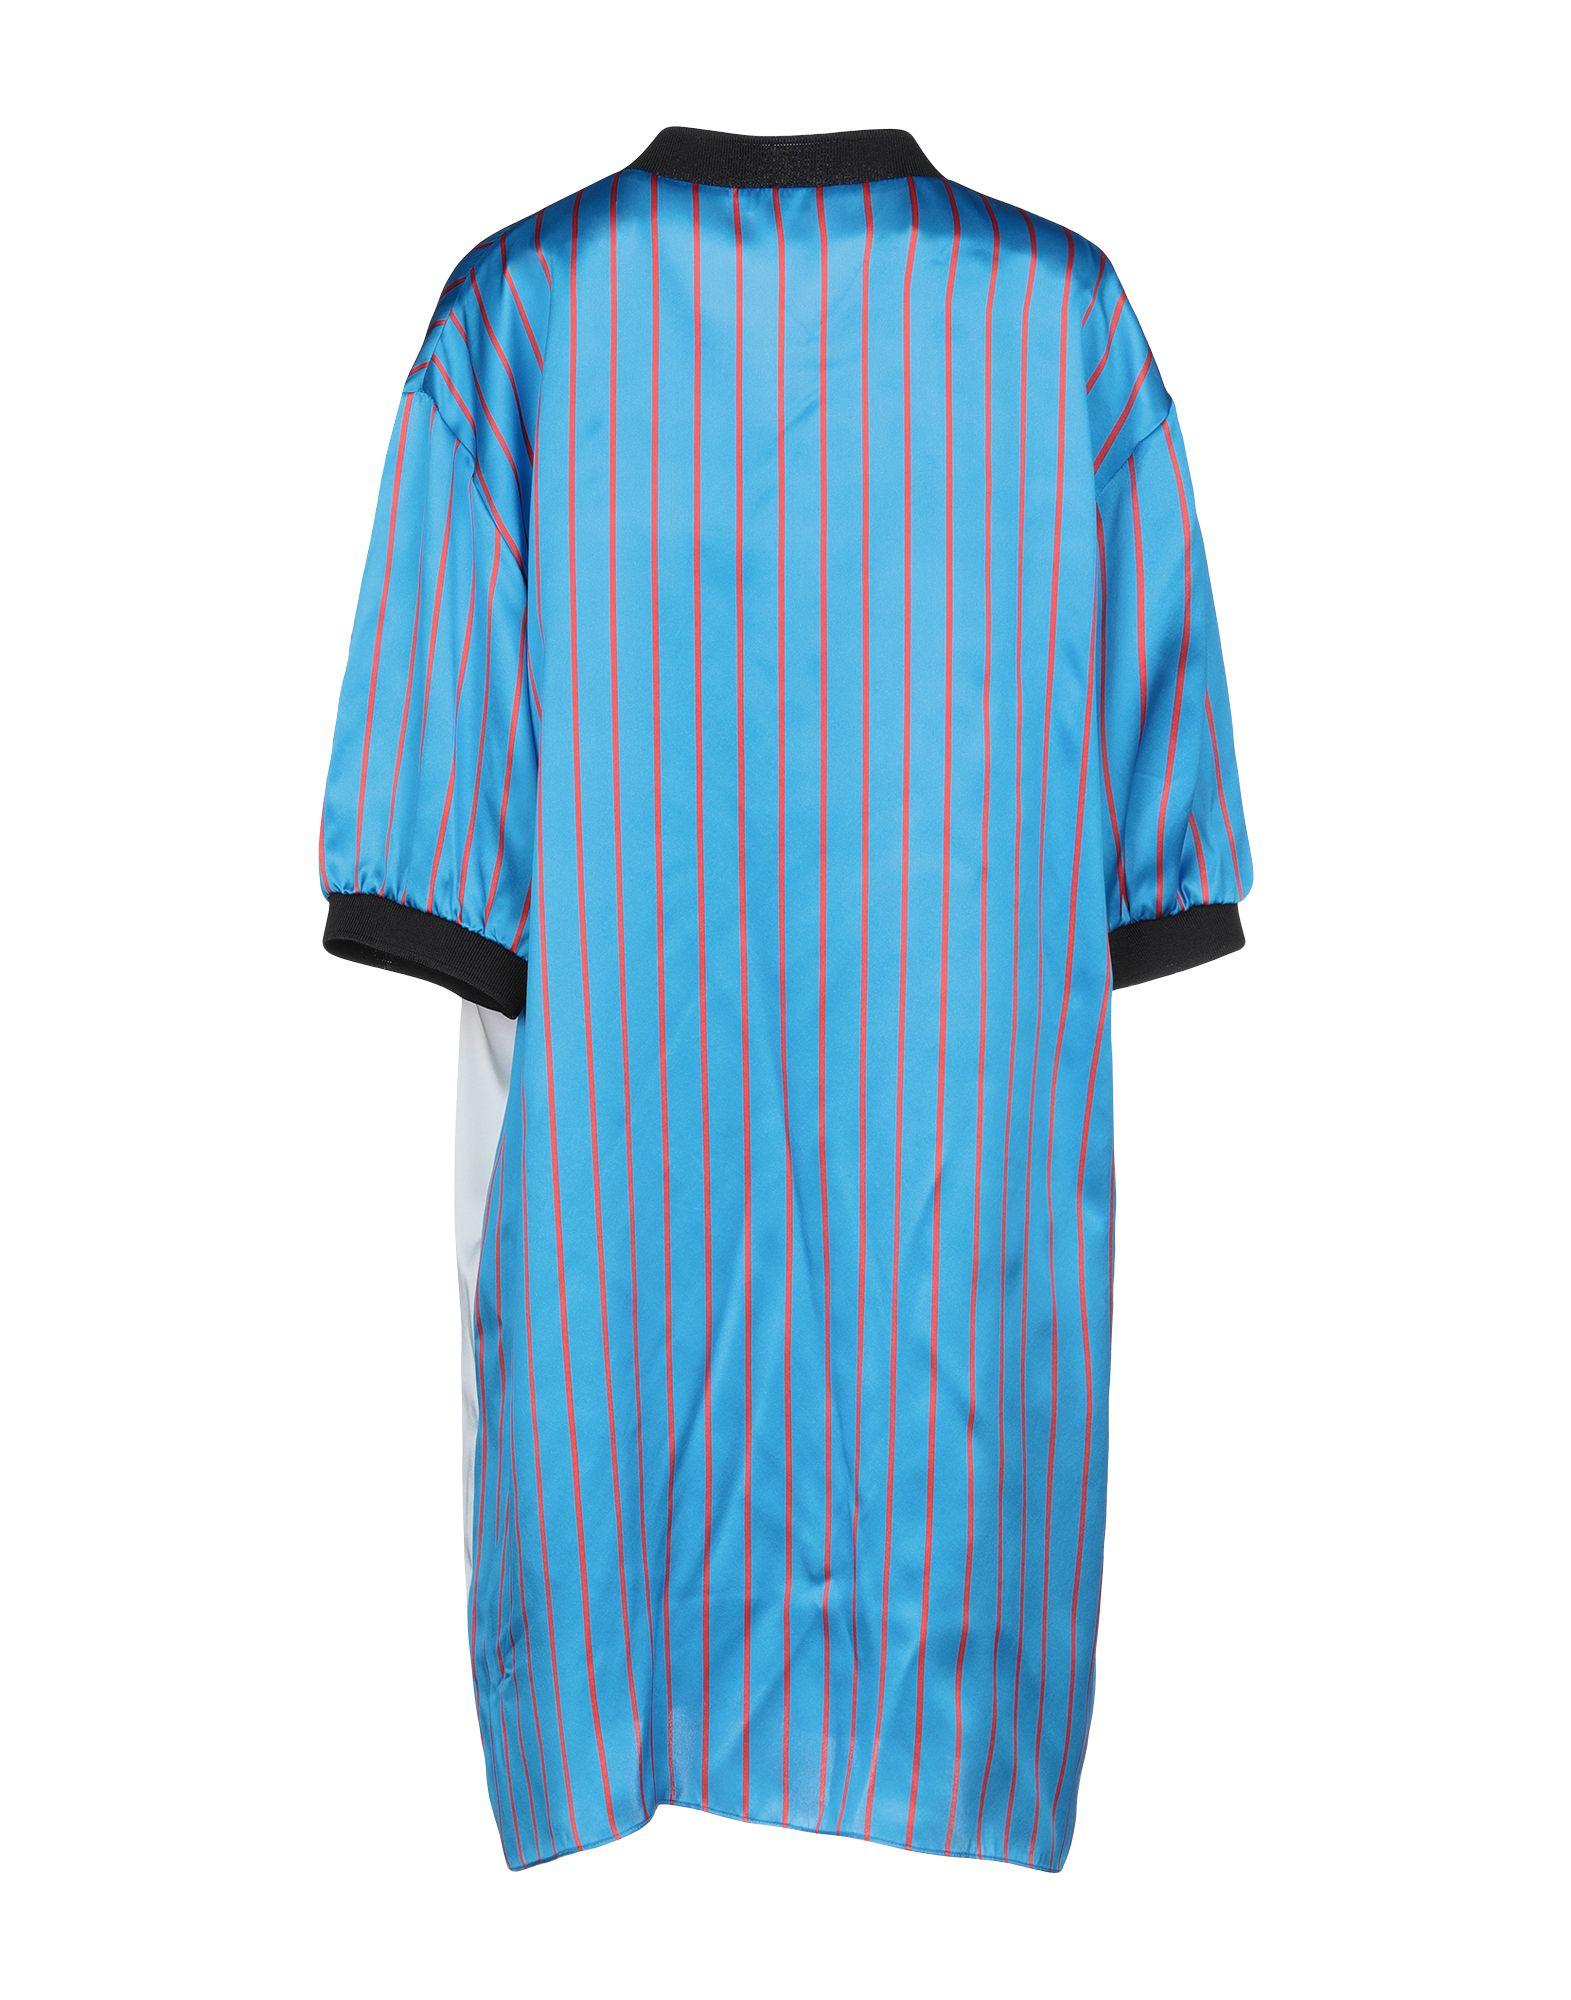 09450bc5 ... KENZO - Blue Short Dress - Lyst. Visit YOOX. Tap to visit site